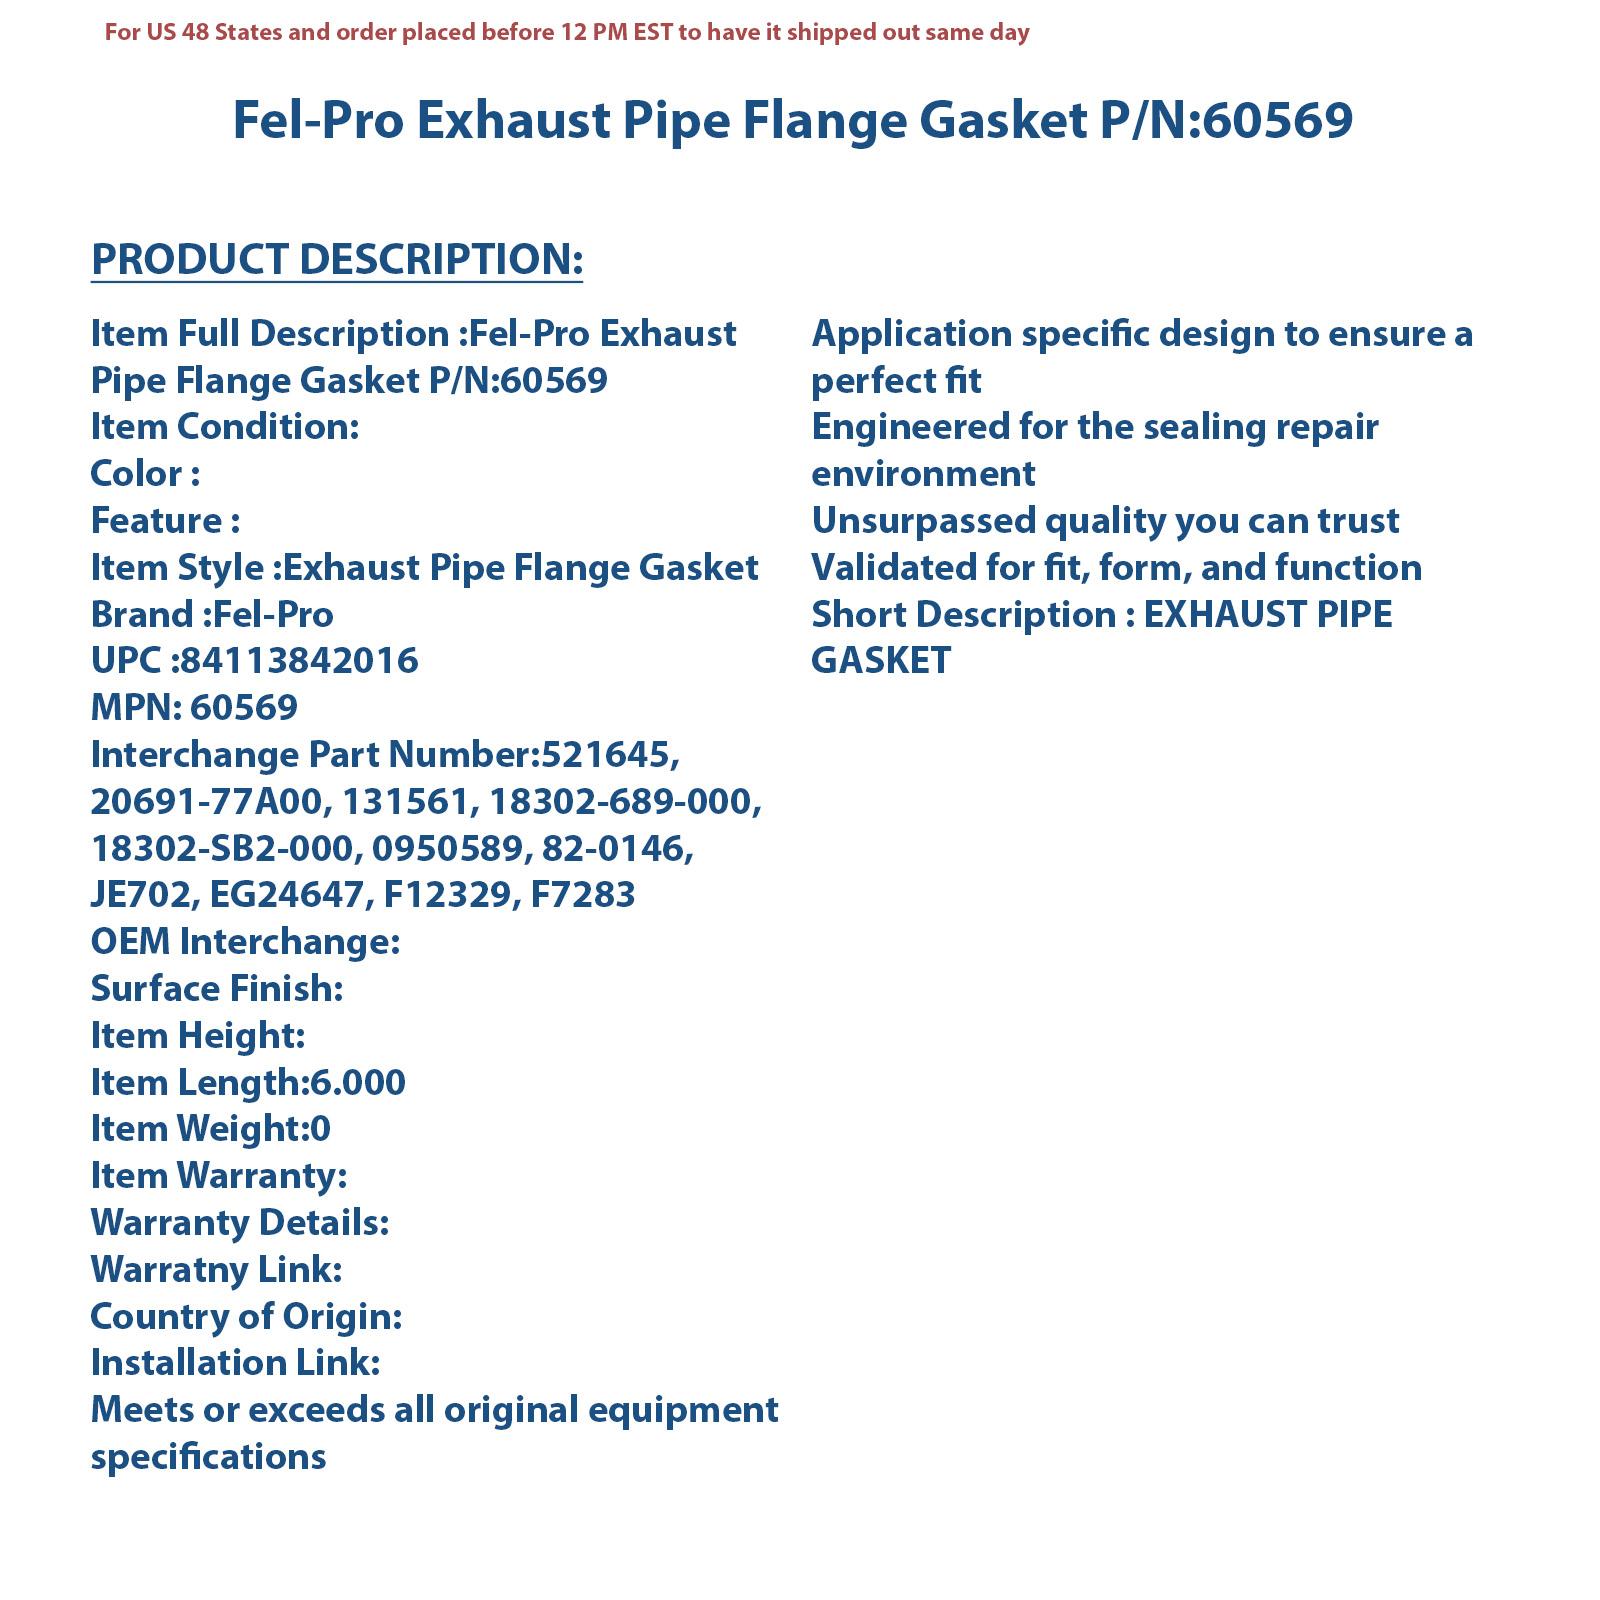 Fel-Pro 60569 Exhaust Pipe Flange Gasket